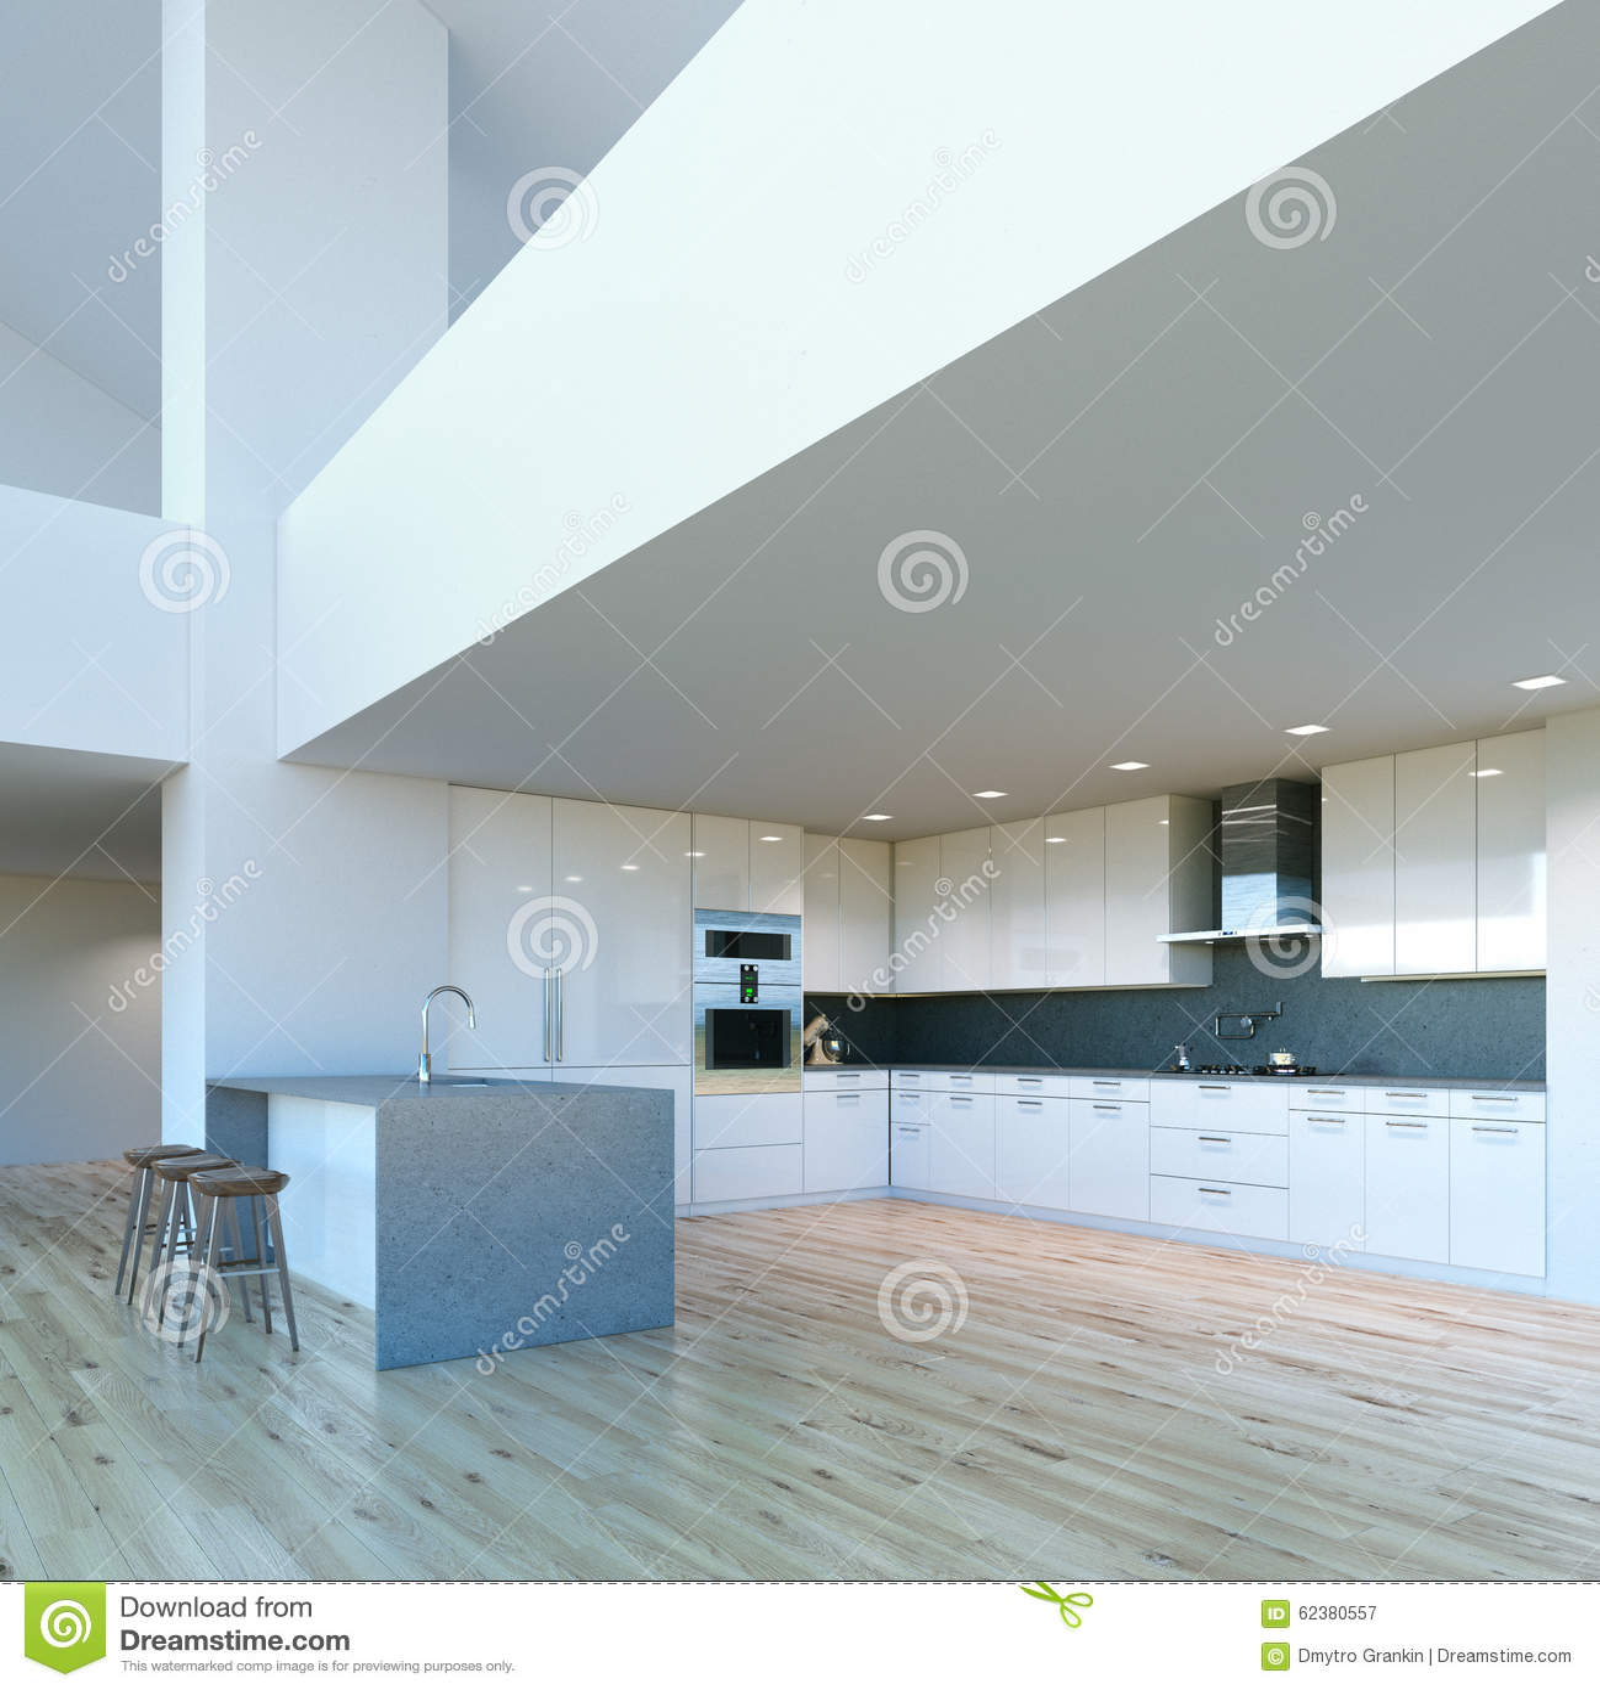 Cozinha Branca Contemporanea Decorada Nova No Interior Grande Luxuoso Ilustracao Stock Ilustracao De Interior Nova 62380557